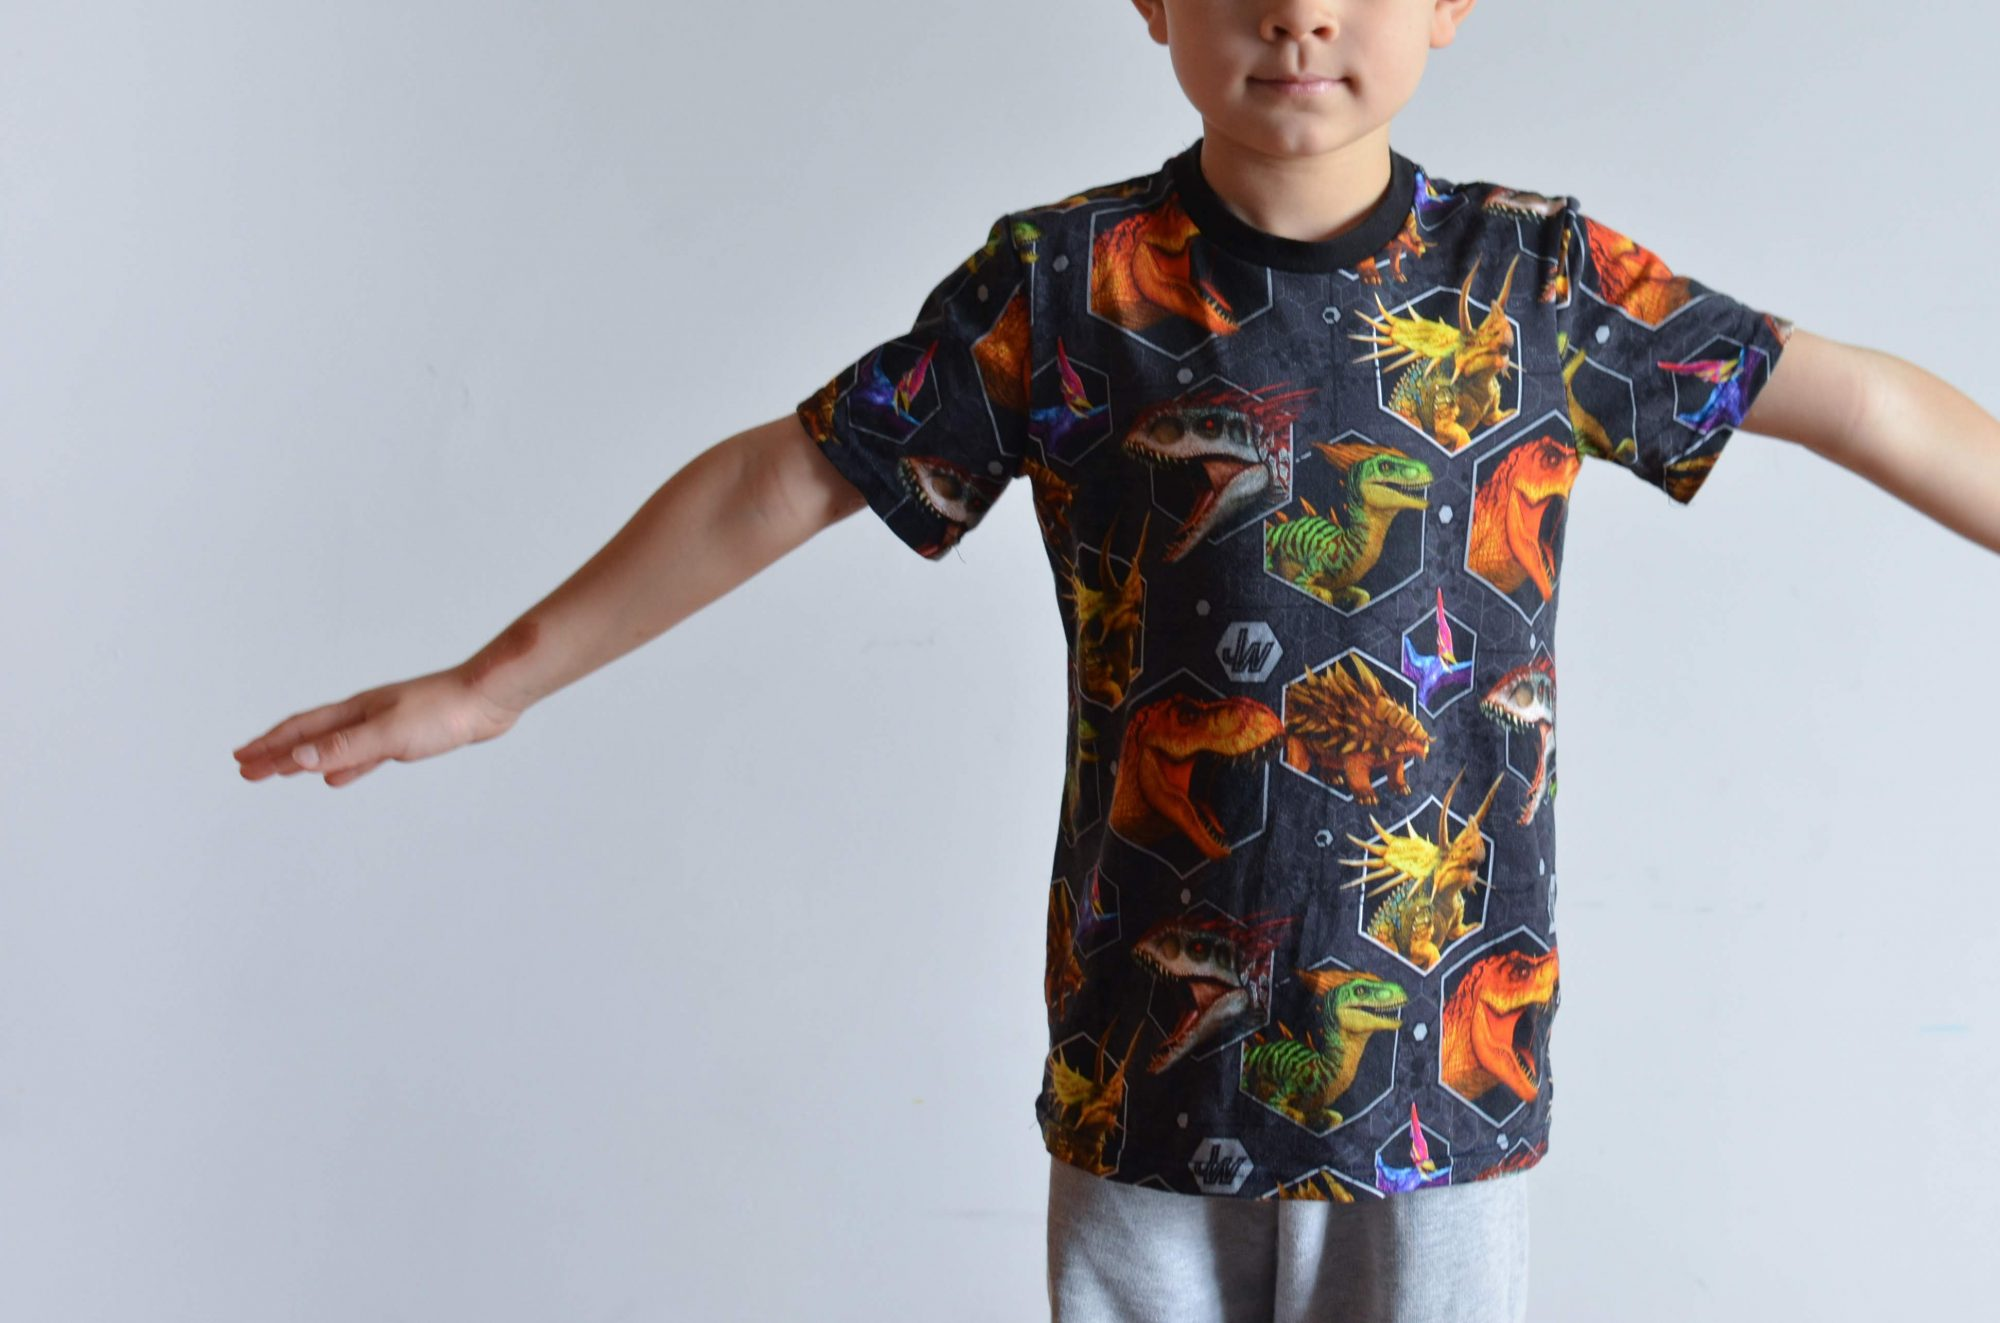 Camiseta Simple – Nuevo Patrón